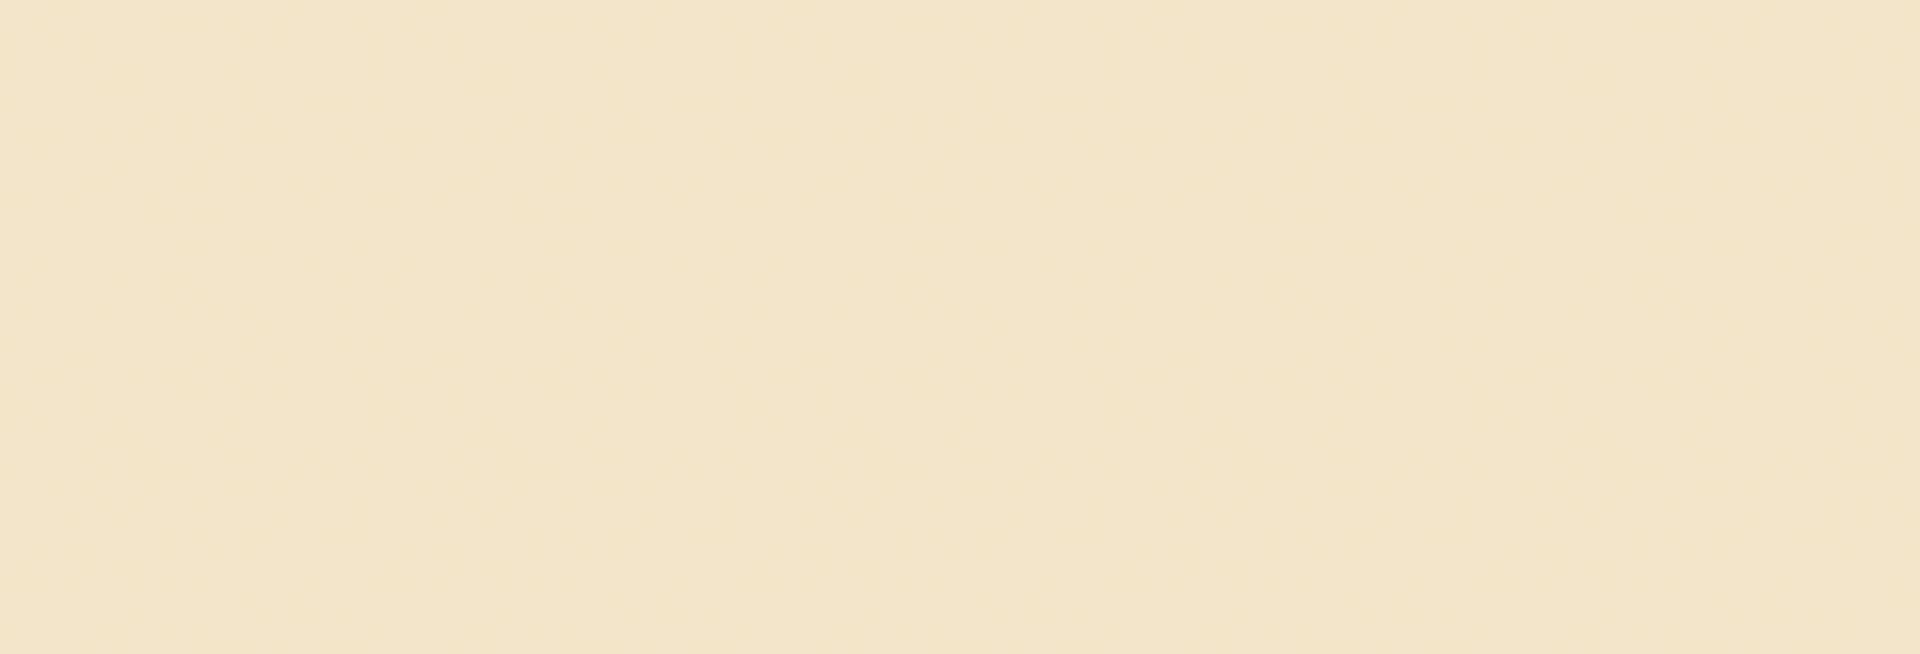 JAVIER CAUMONT